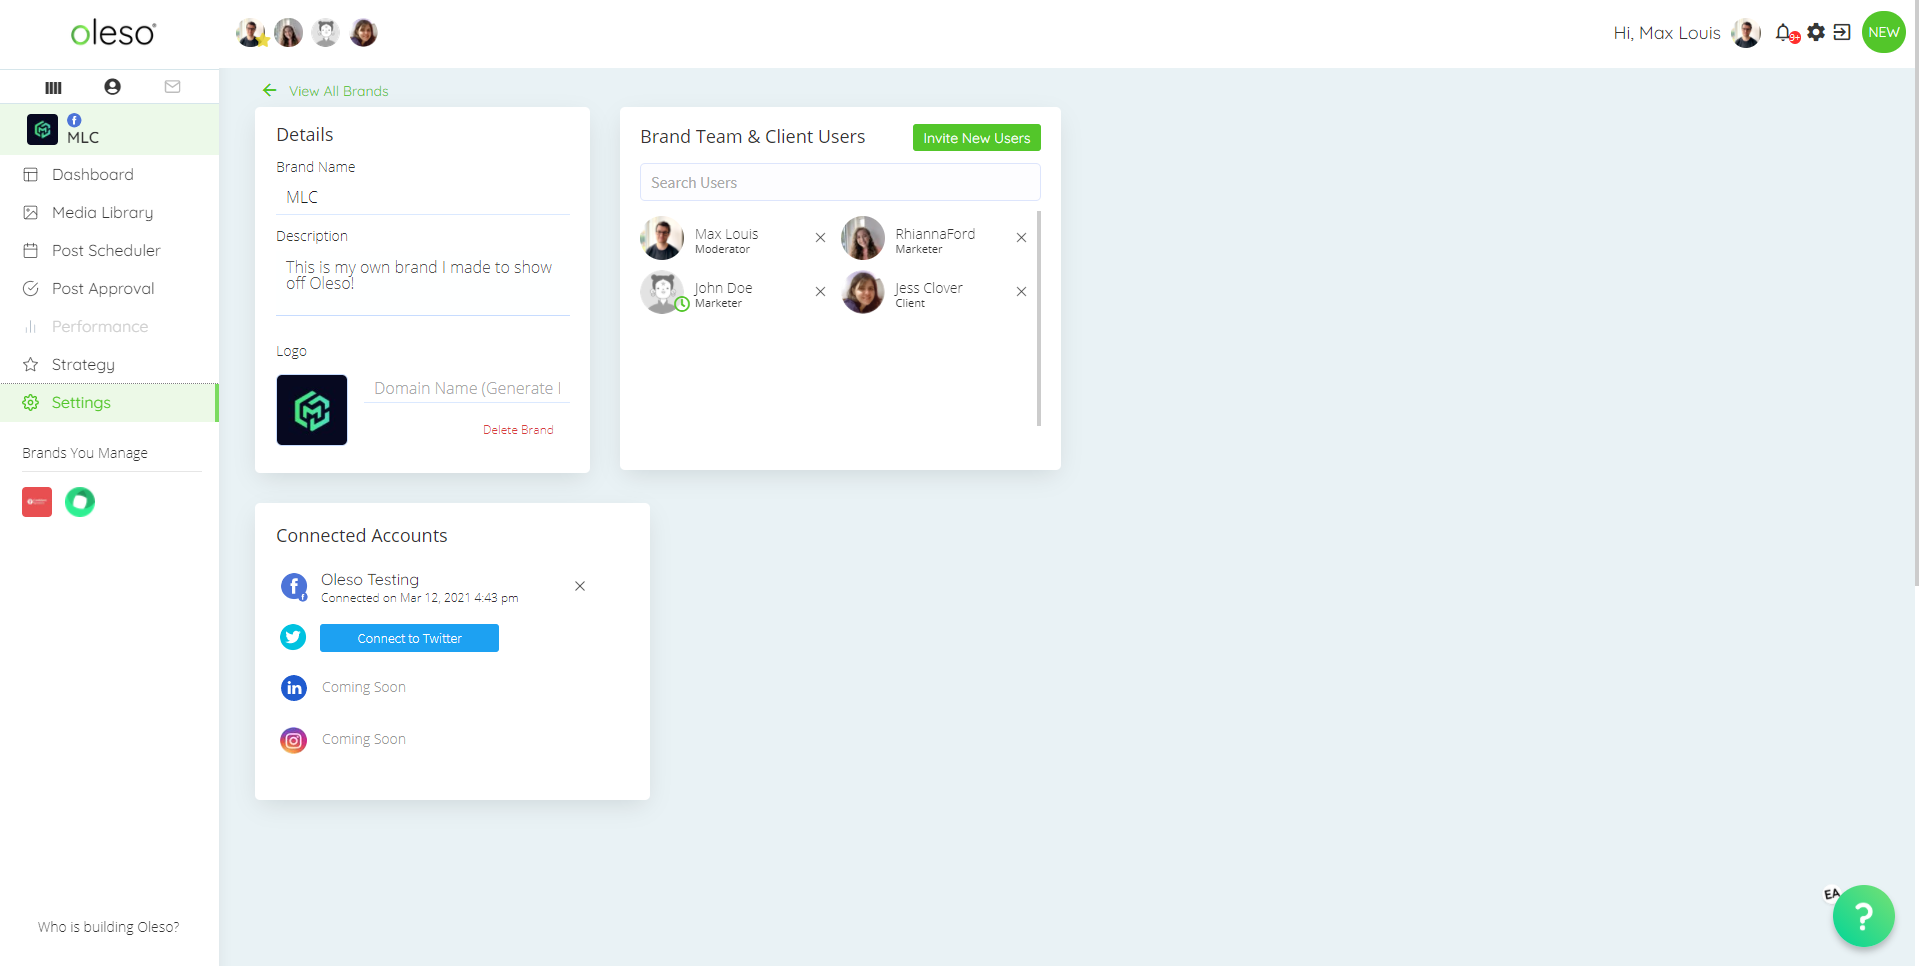 Oleso Social Media Tool - Settings